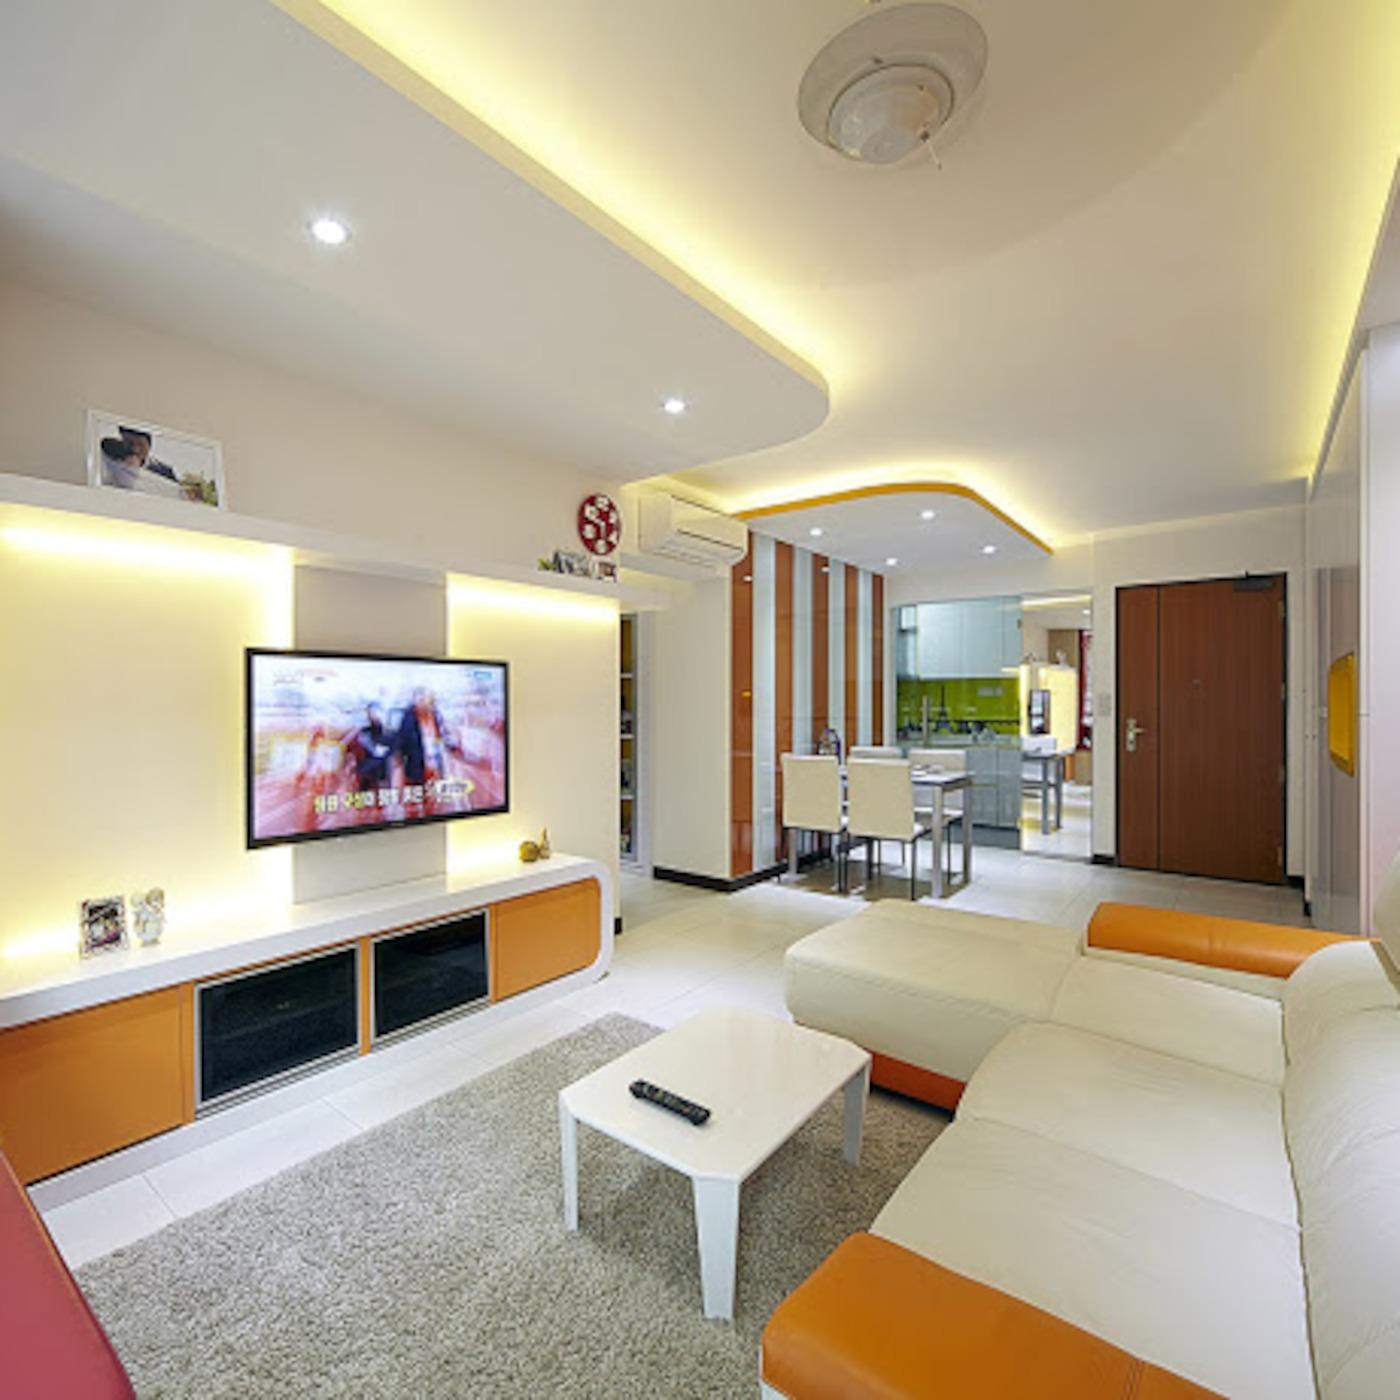 3 Room Flat 3 room hdb interior design singapore